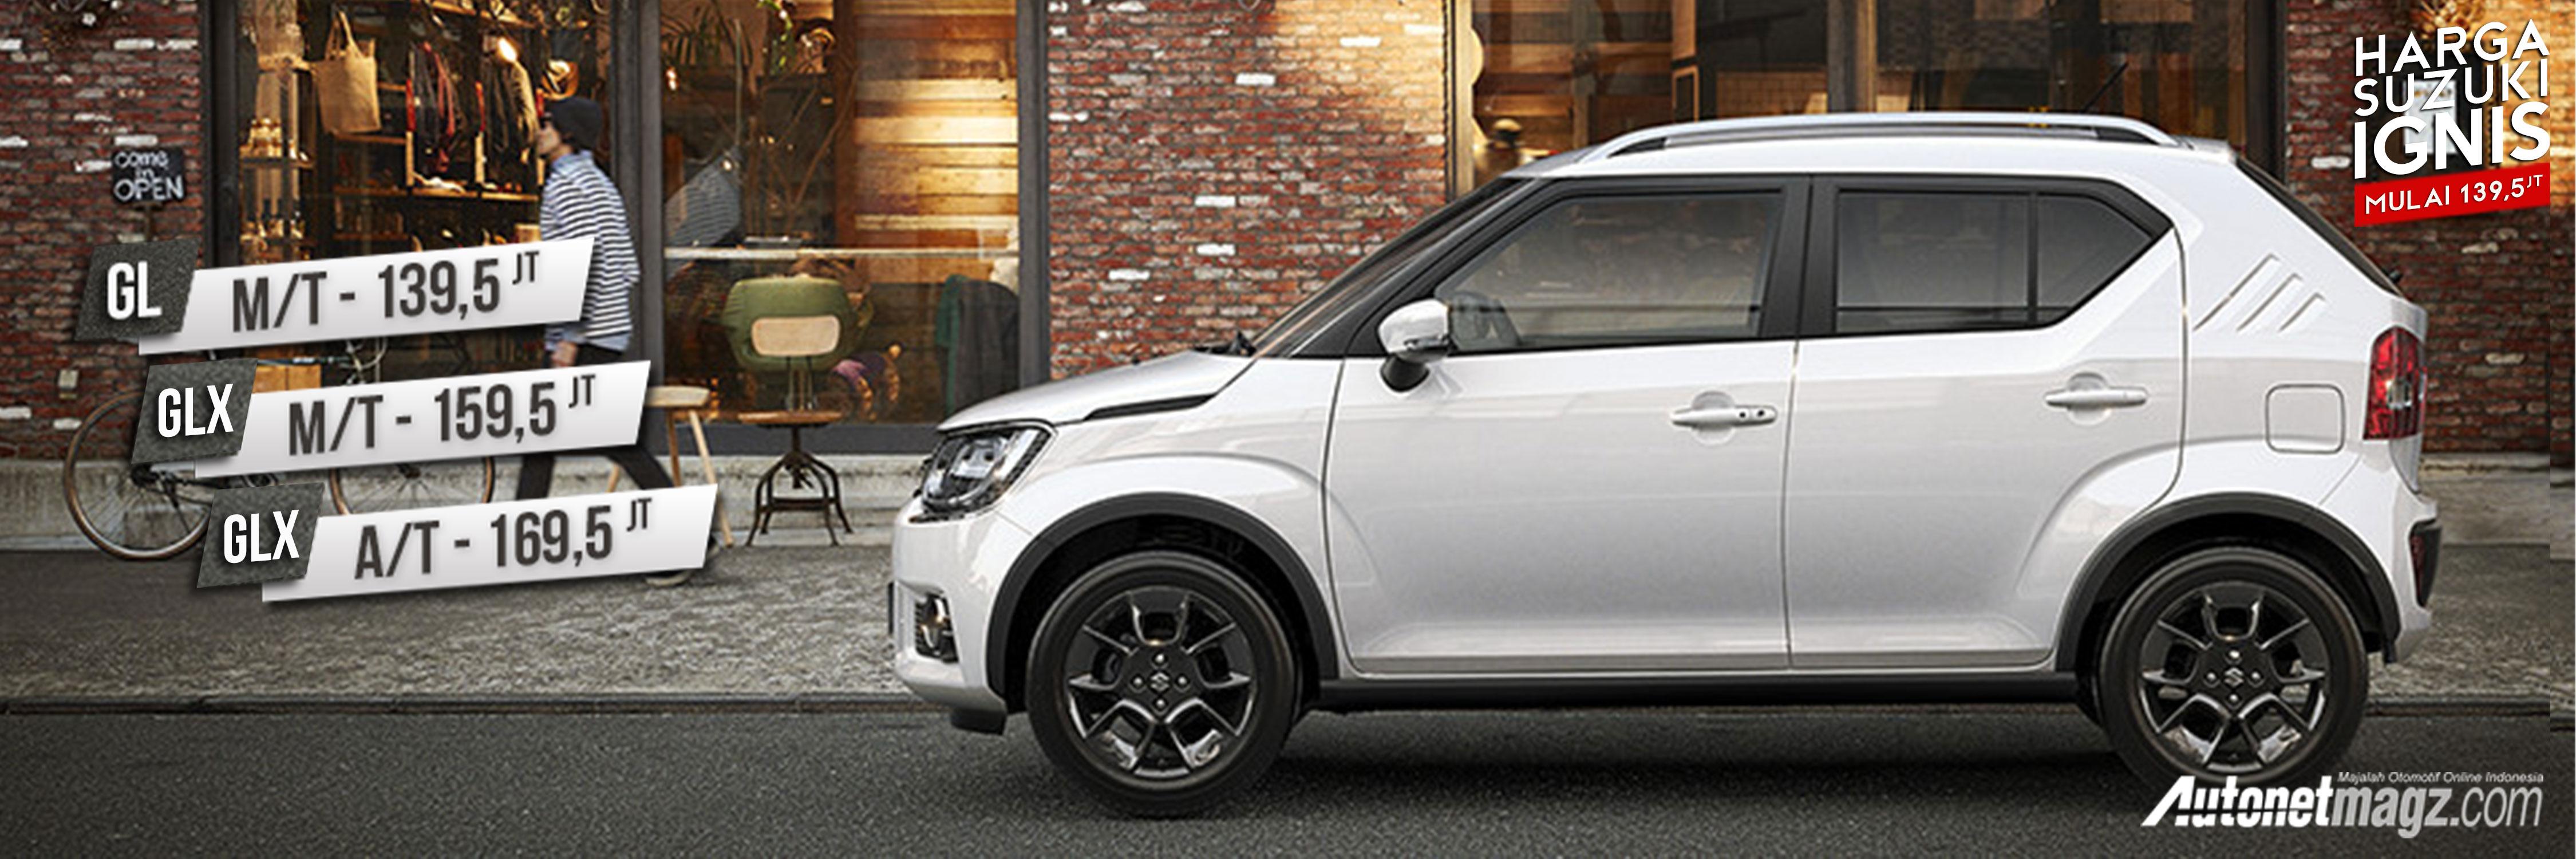 2017 Suzuki Ignis Indonesia Gl Gx Harga Autonetmagz Review